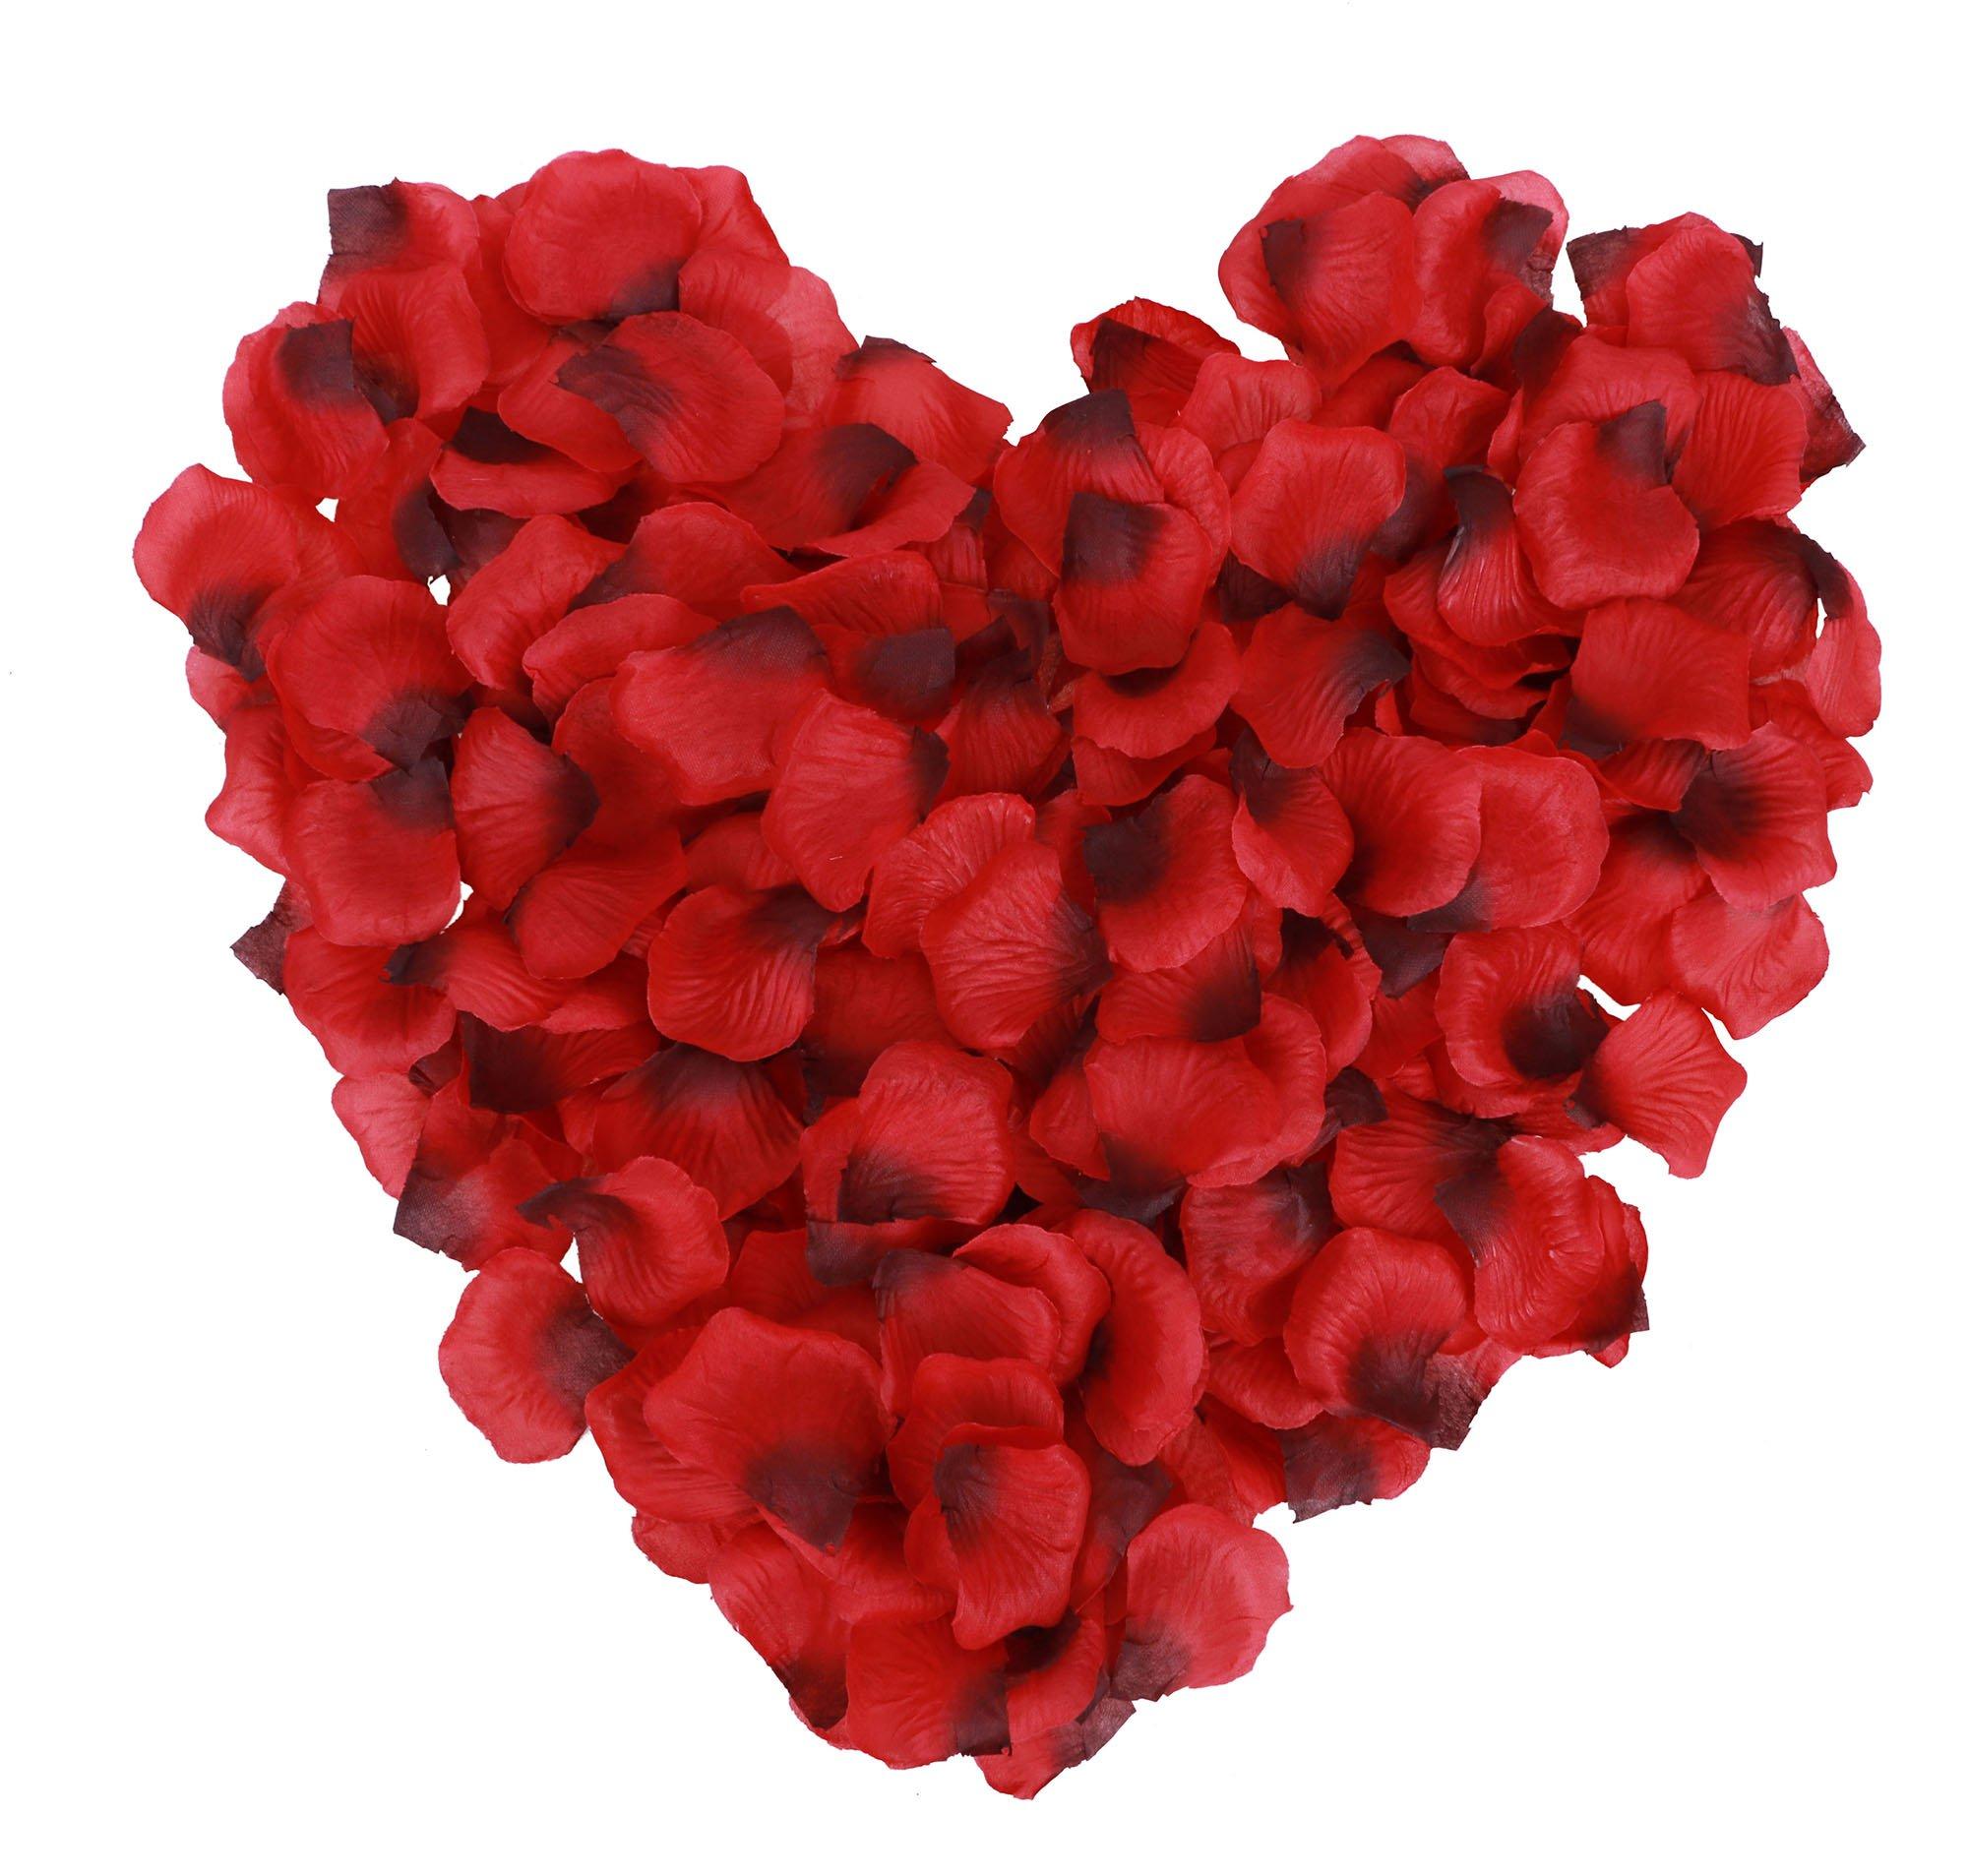 silk flower arrangements jasmine 1000 pieces seperated non-woven rose petals weddings rose petals for romantic night valentine flower deor,red/dark red